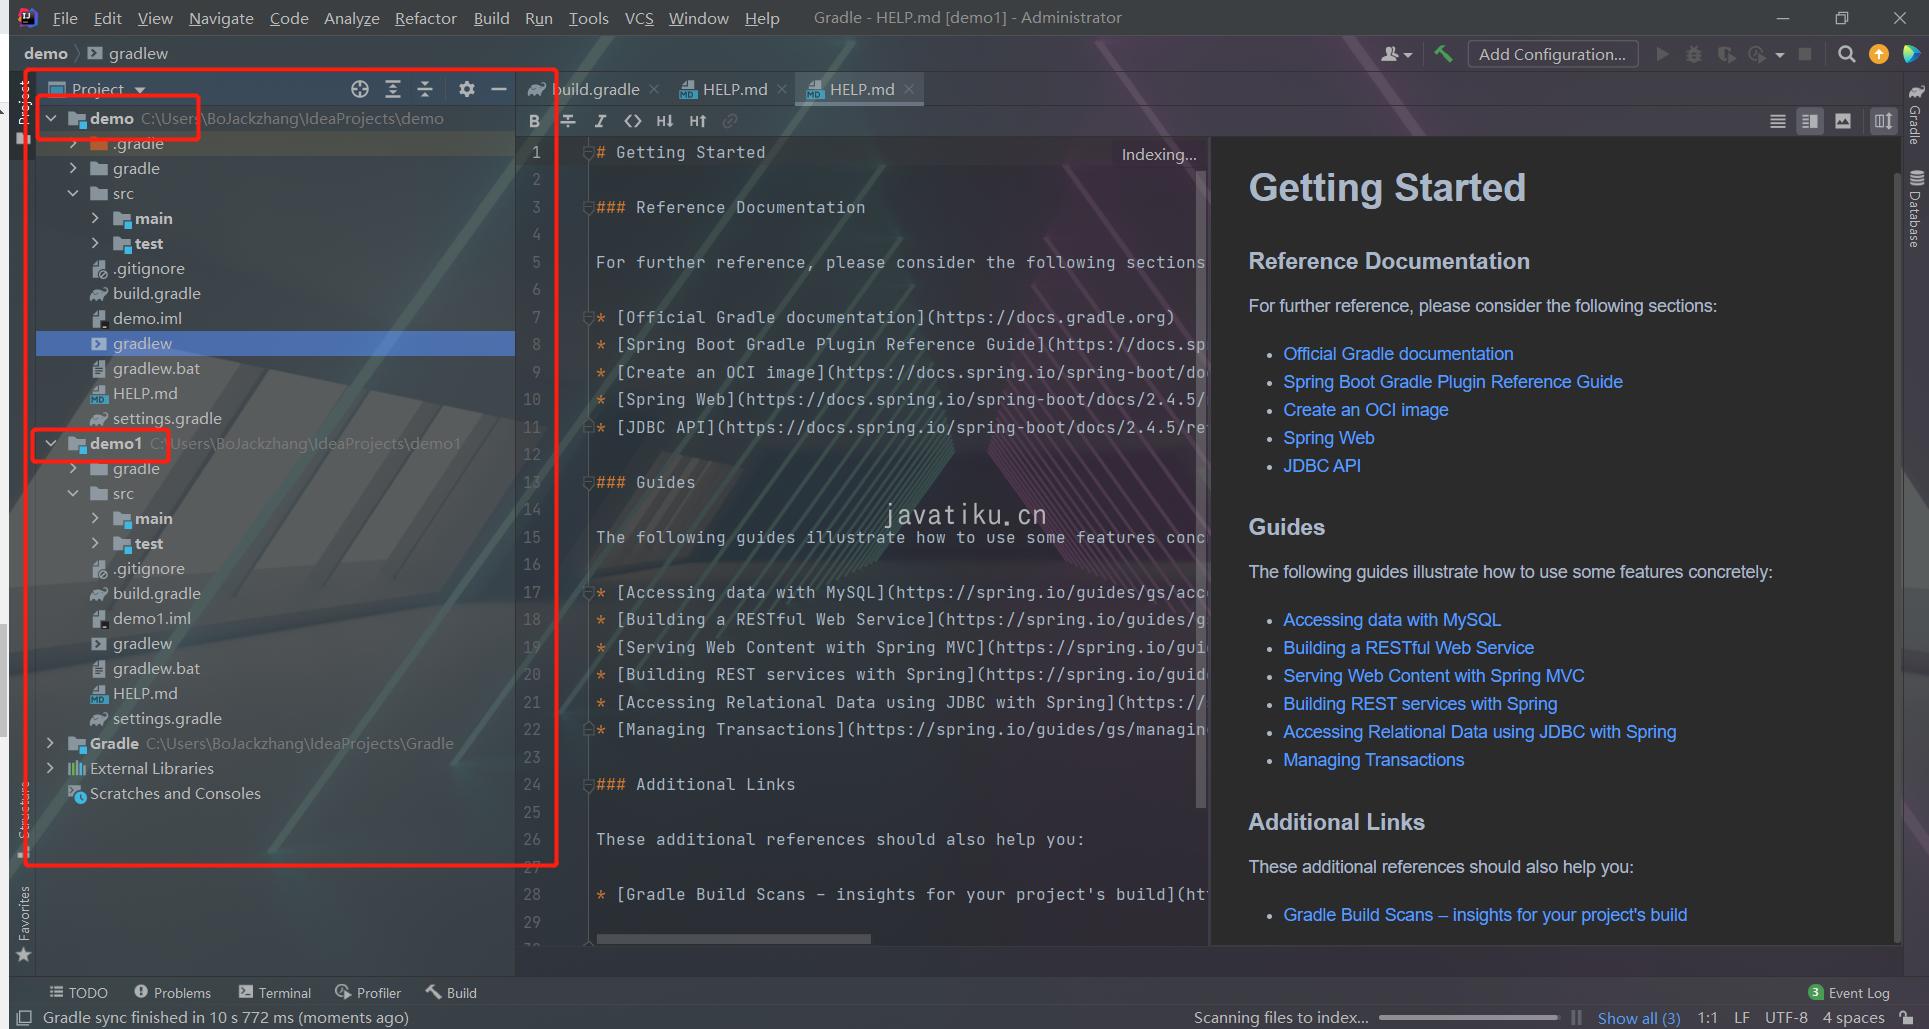 IDEA创建SpringBoot Gradle多项目工程